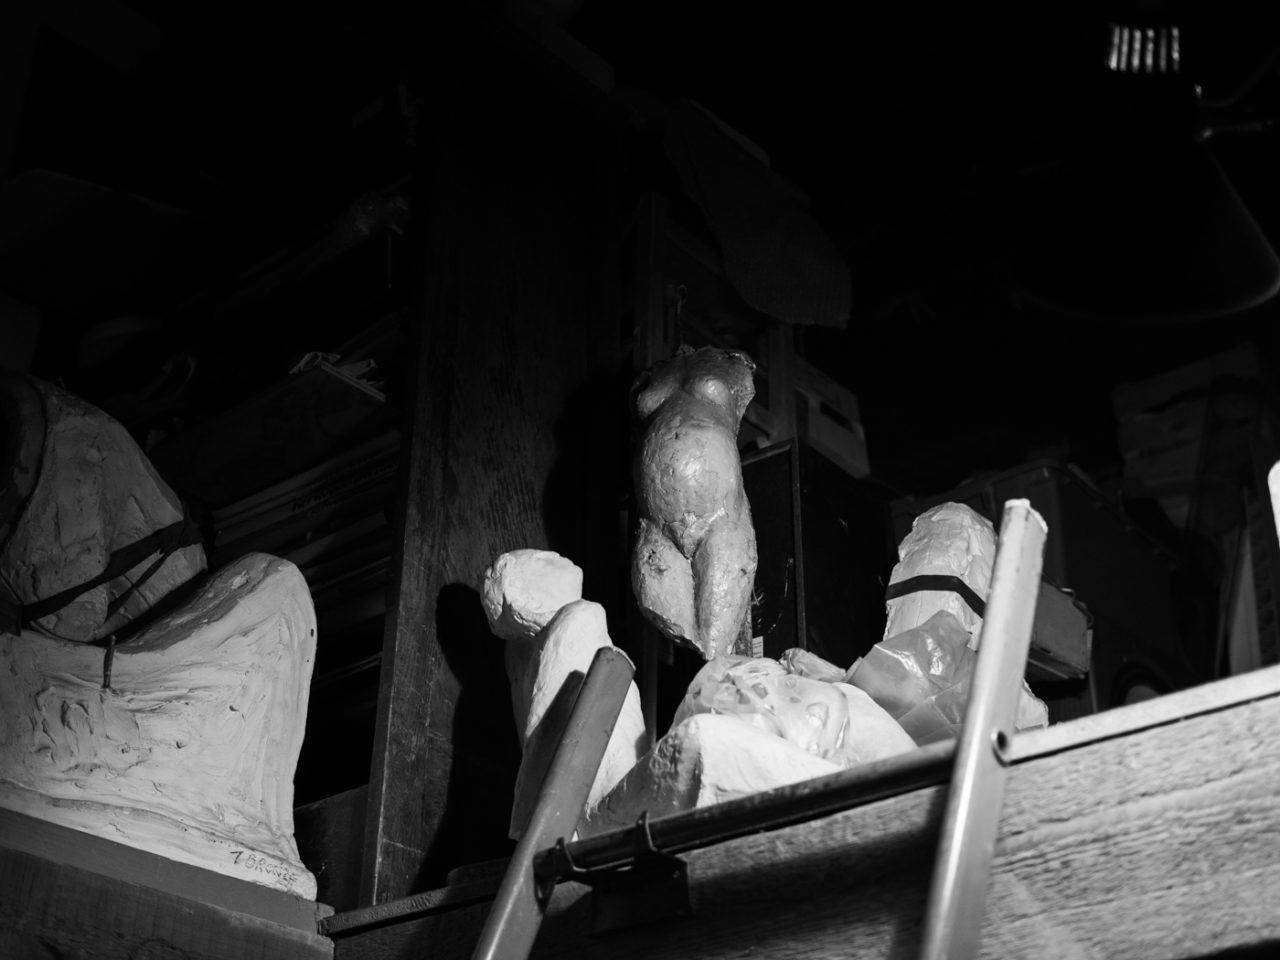 In Spirit : The philosopher sculptor